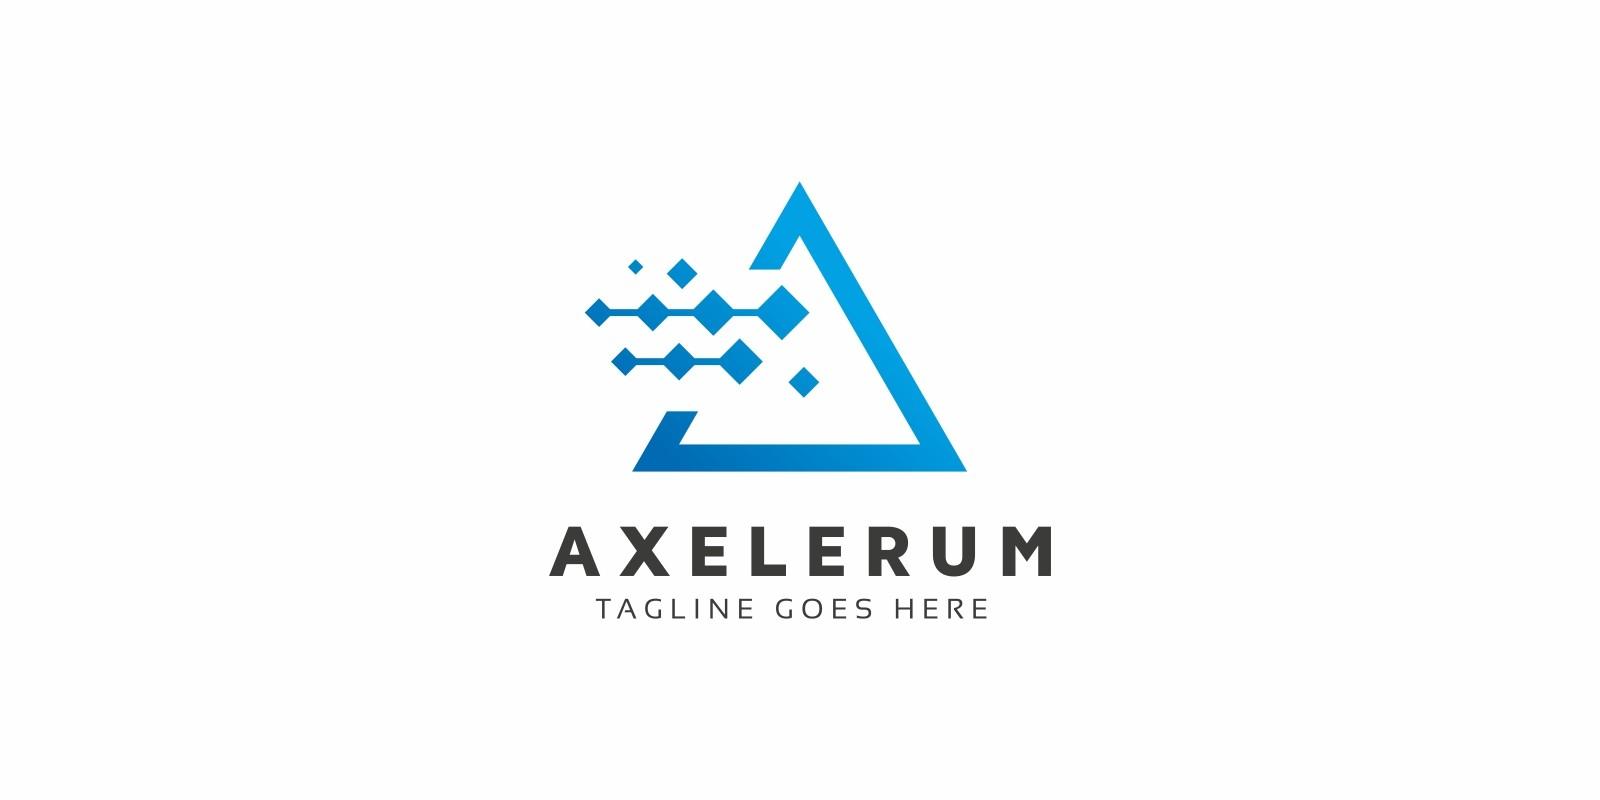 Axelerum A Letter Logo